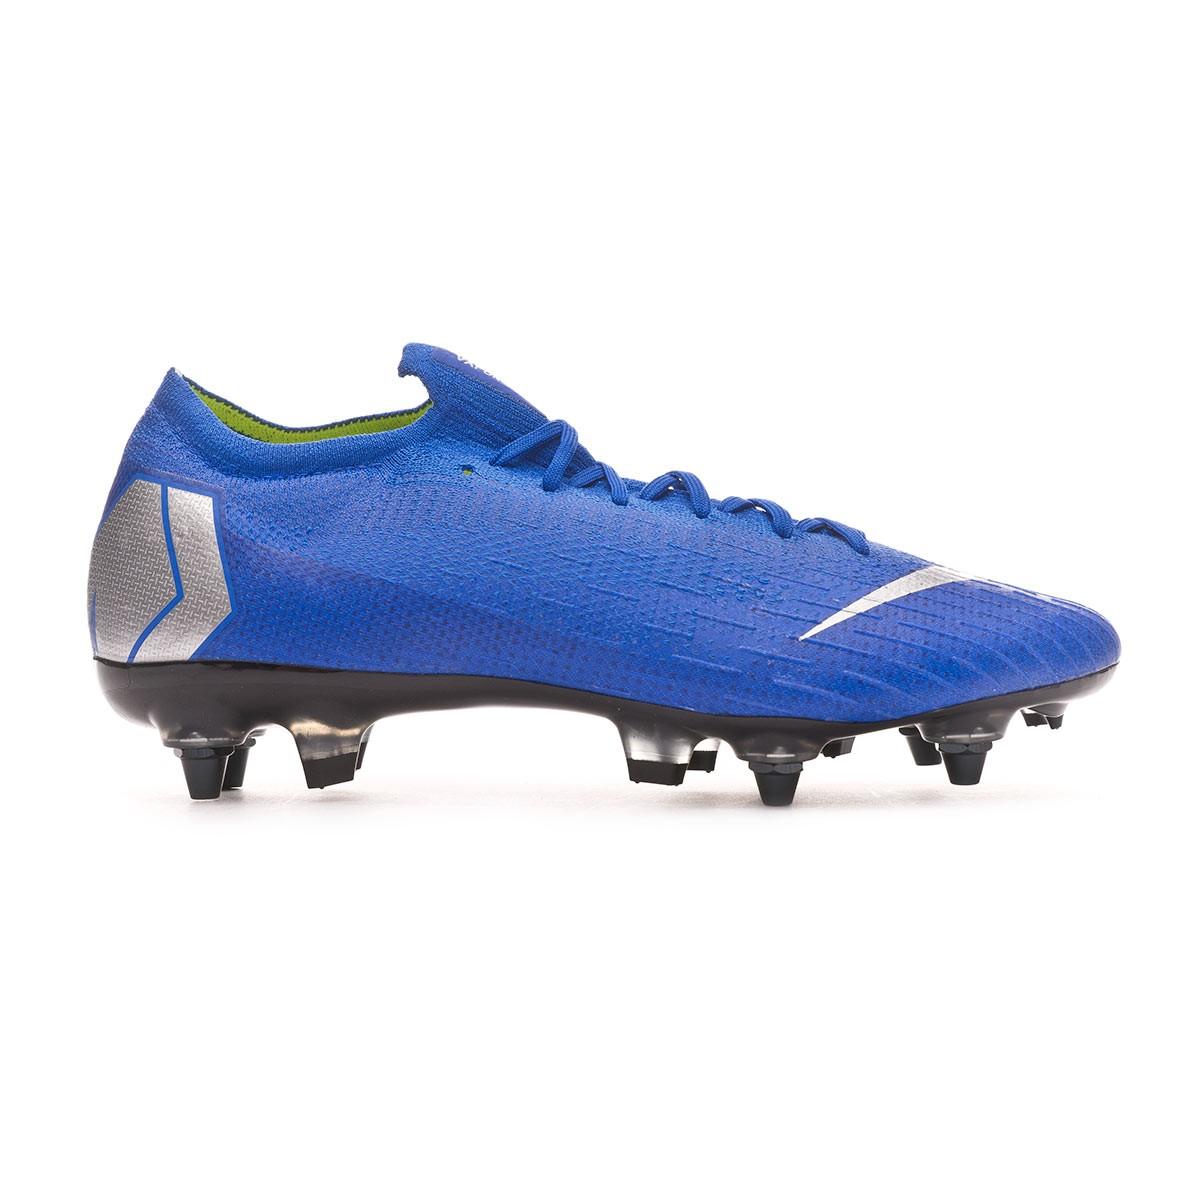 10edd2d2c22 Football Boots Nike Mercurial Vapor XII Elite Anti-Clog SG-Pro Racer  blue-Matallic silver-Black - Football store Fútbol Emotion